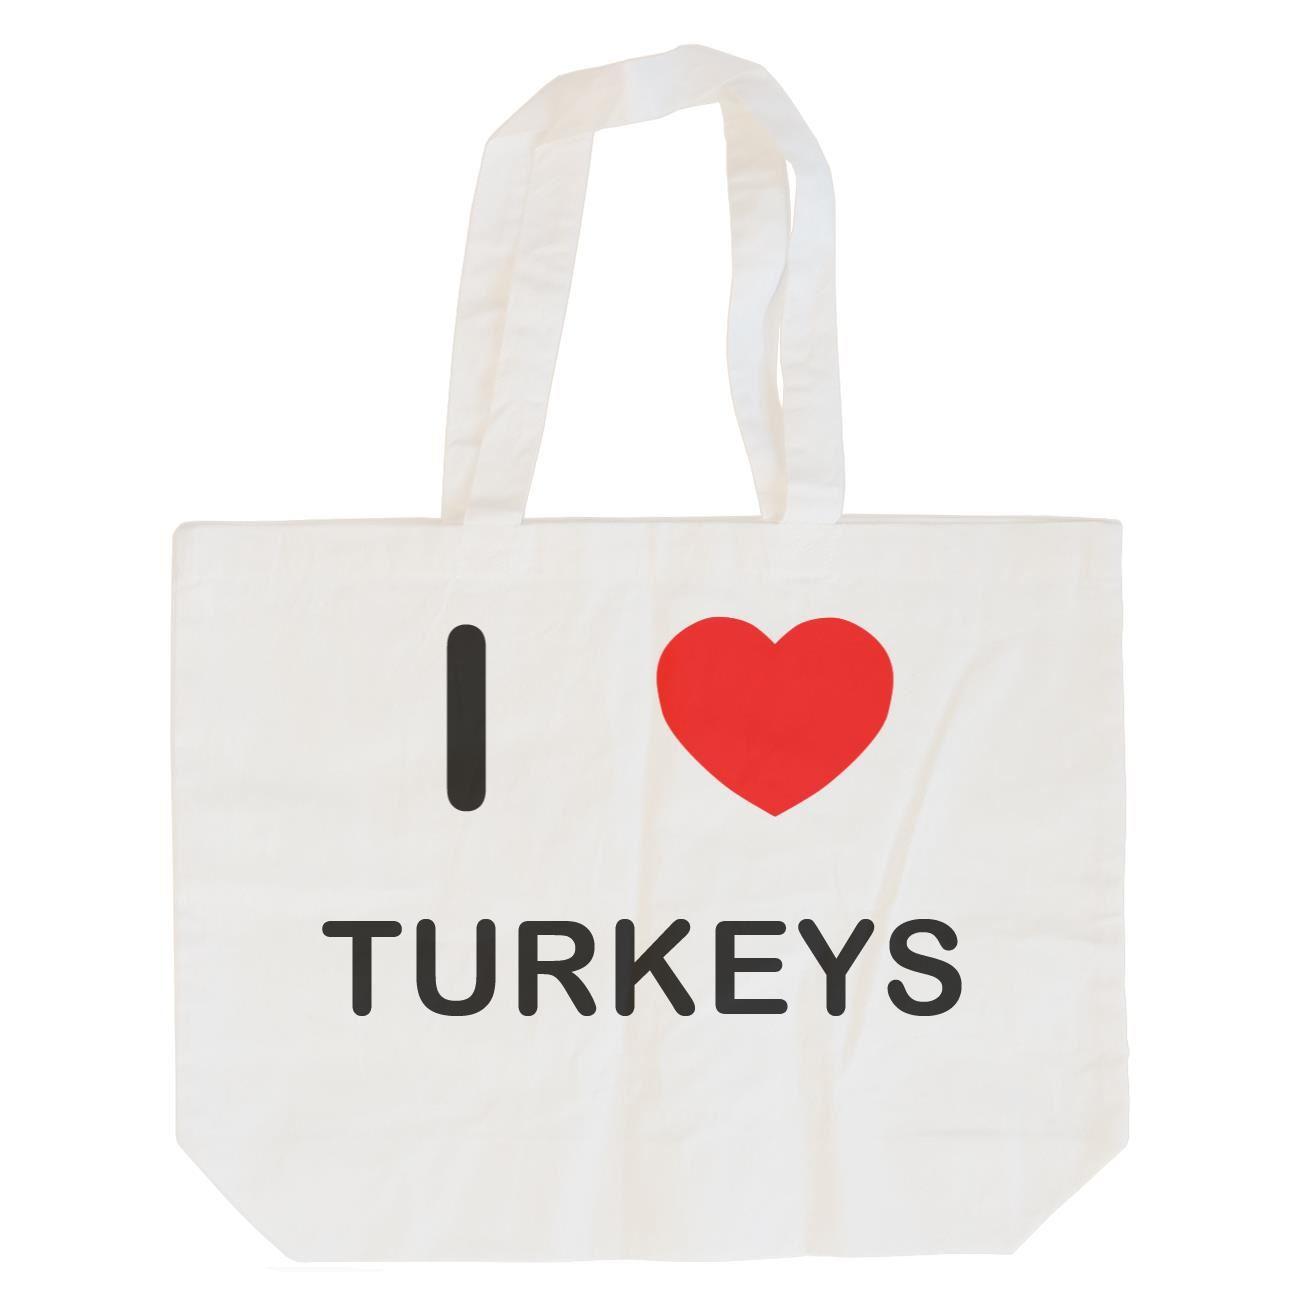 I Love Turkeys - Cotton Bag | Size choice Tote, Shopper or Sling